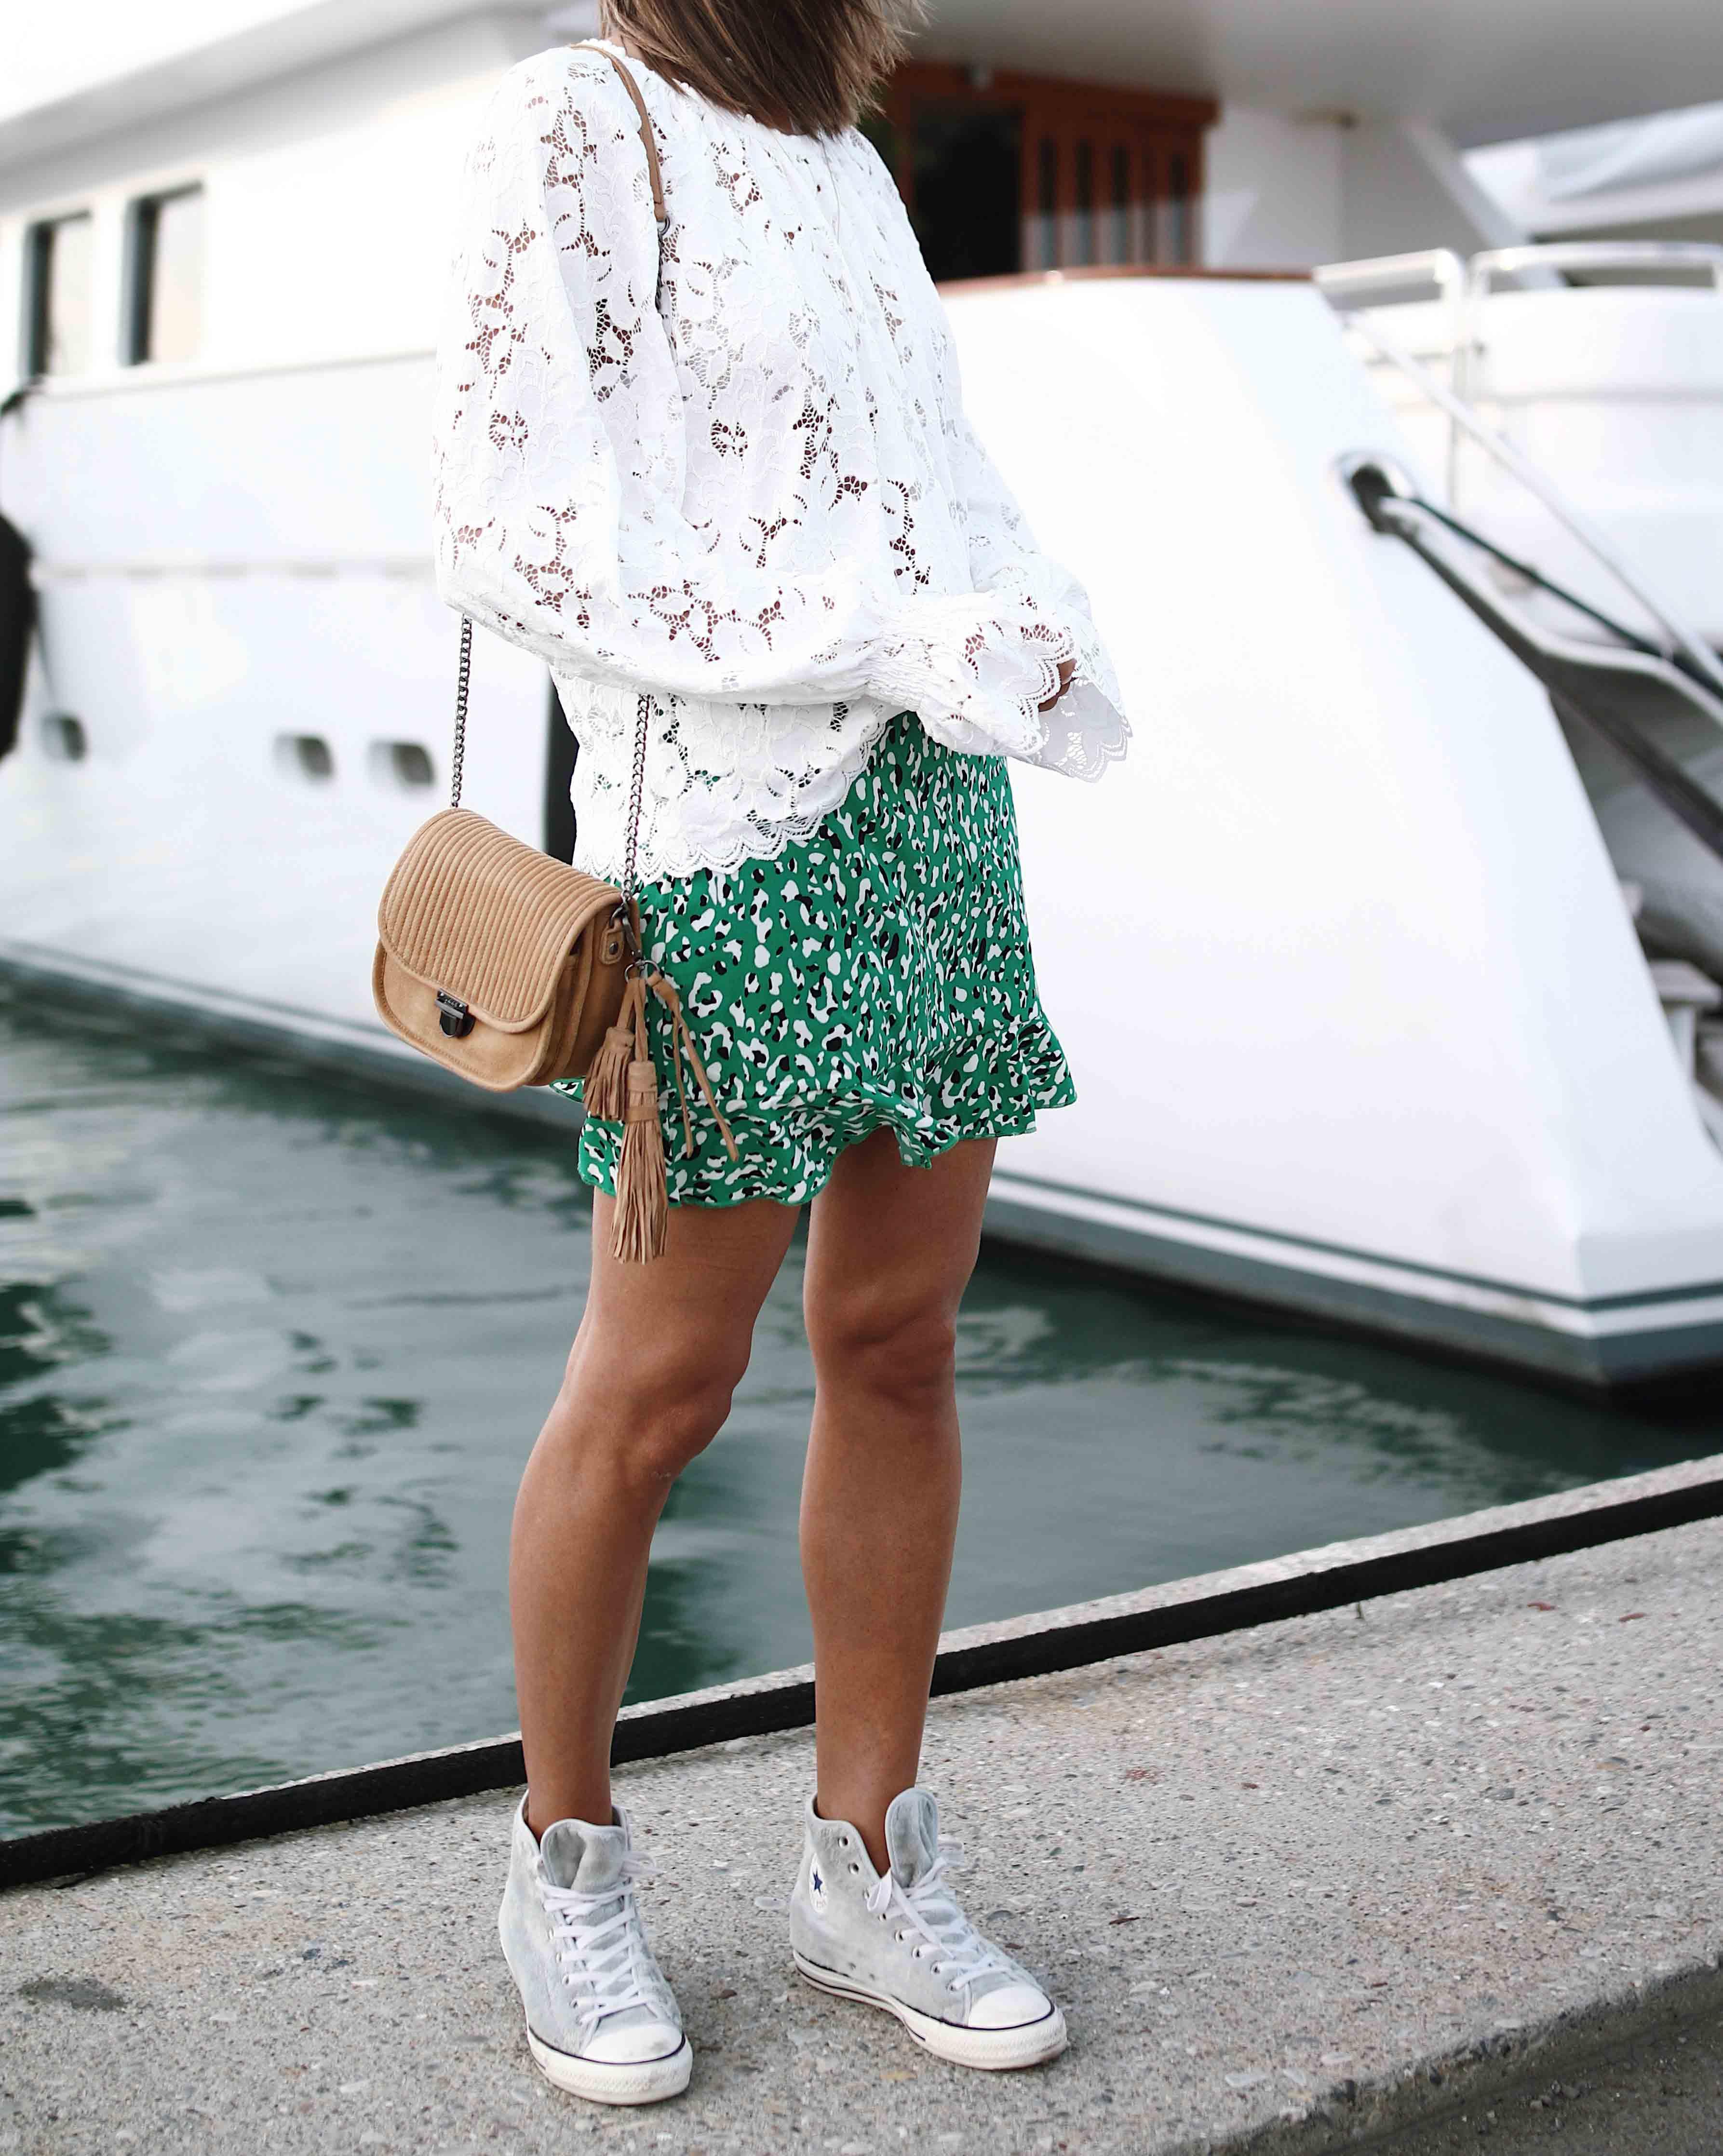 @chon.and.chon www.chonandchon.com superdown lini skirt, free people lace top, sac bandoulière IKKS, casual style, white lace top, blouse blanche dentelle